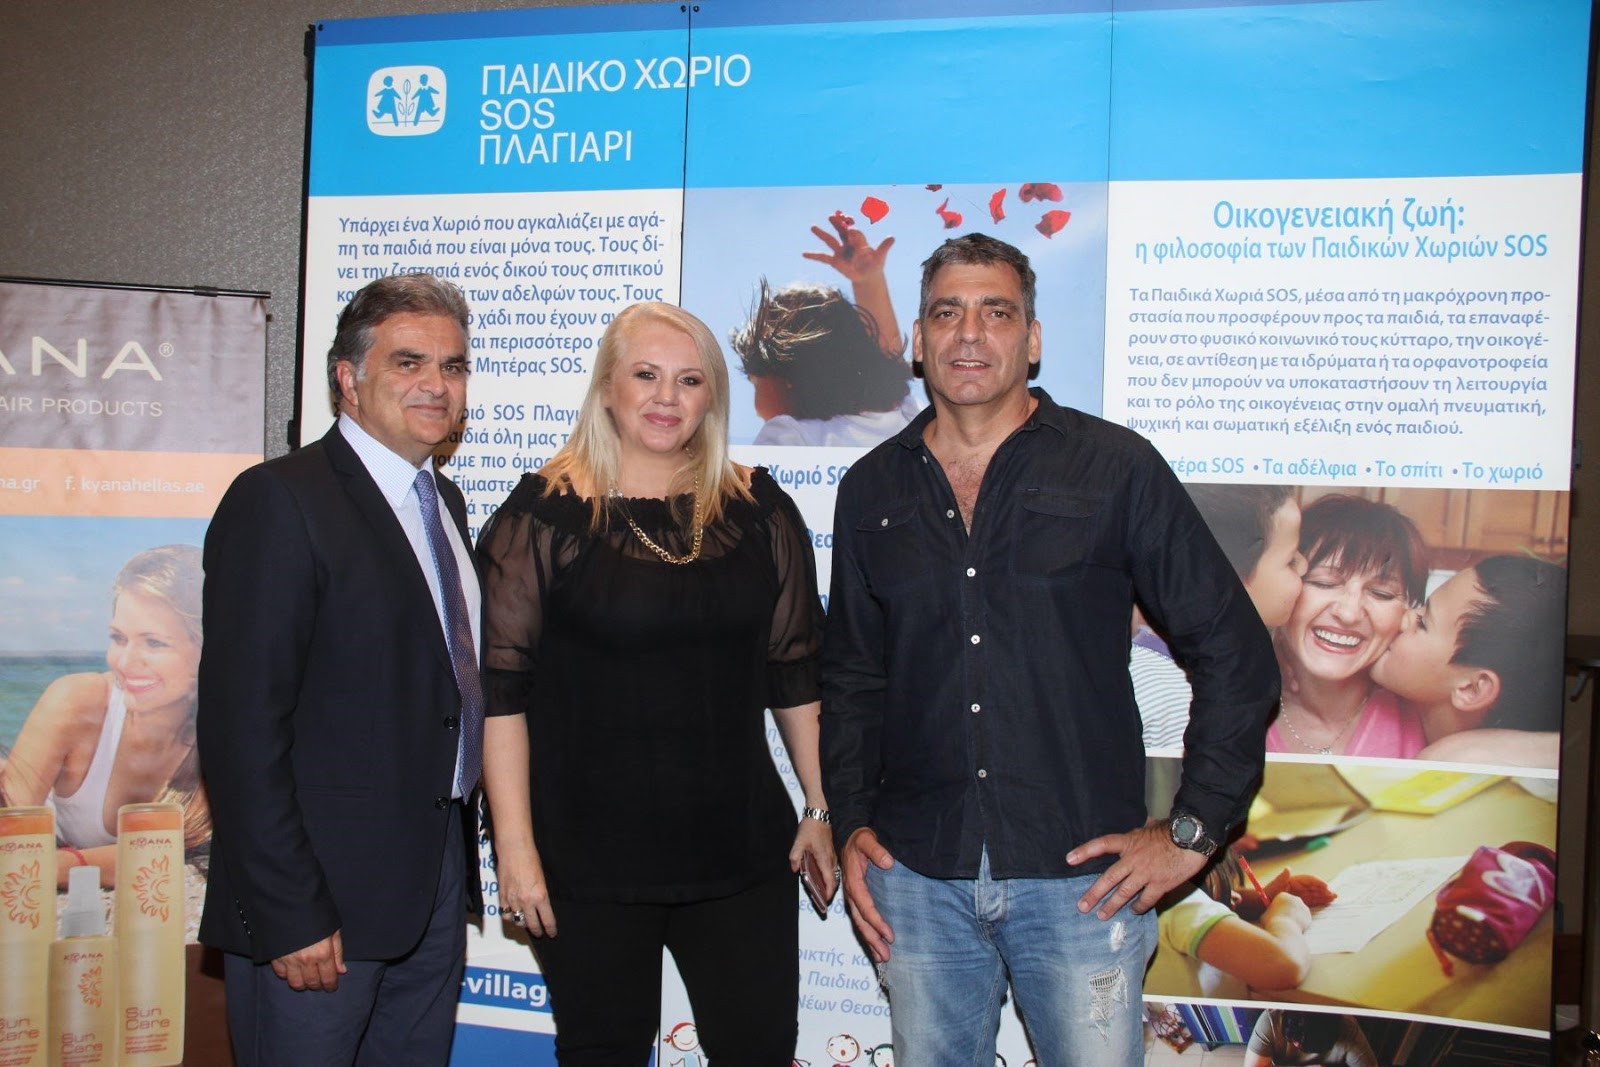 eeedfffead Γιώργος Πρωτόπαπας (Γενικός Διευθυντής των Παιδικών Χωριών SOS Ελλάδος)